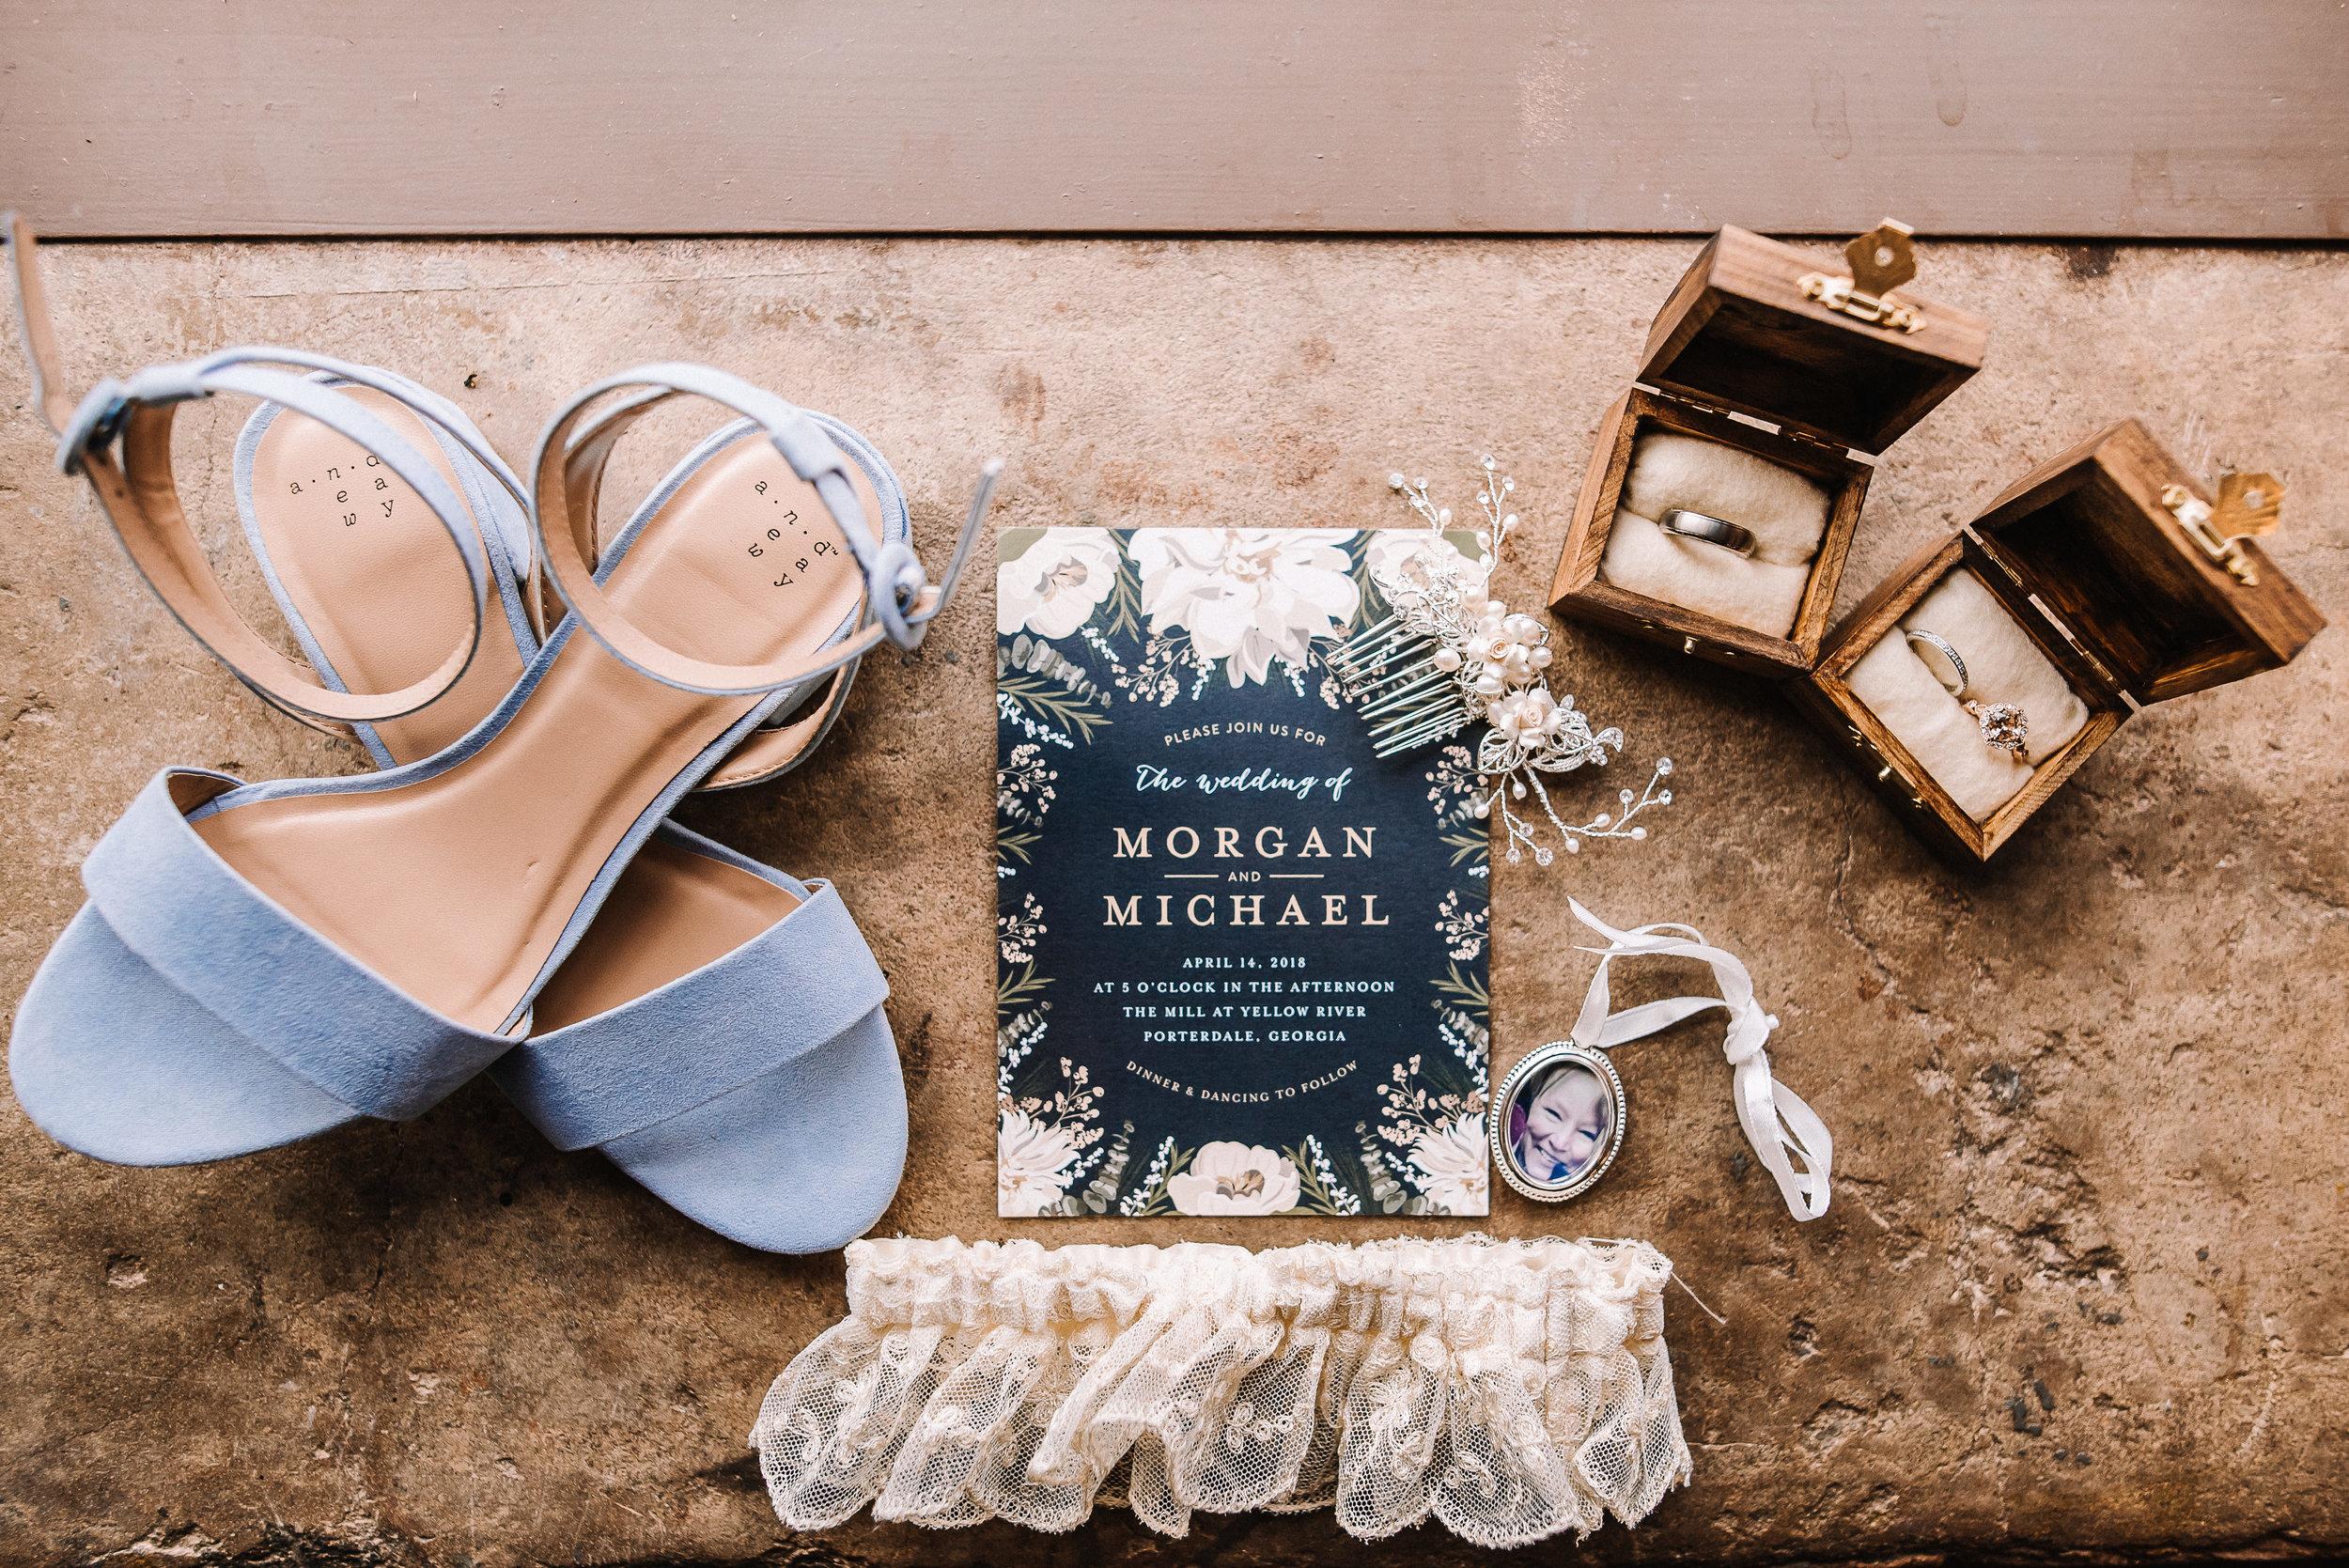 Morgan Wedding_Mill at Yellow River_Ashley Benham Photography-3.jpg